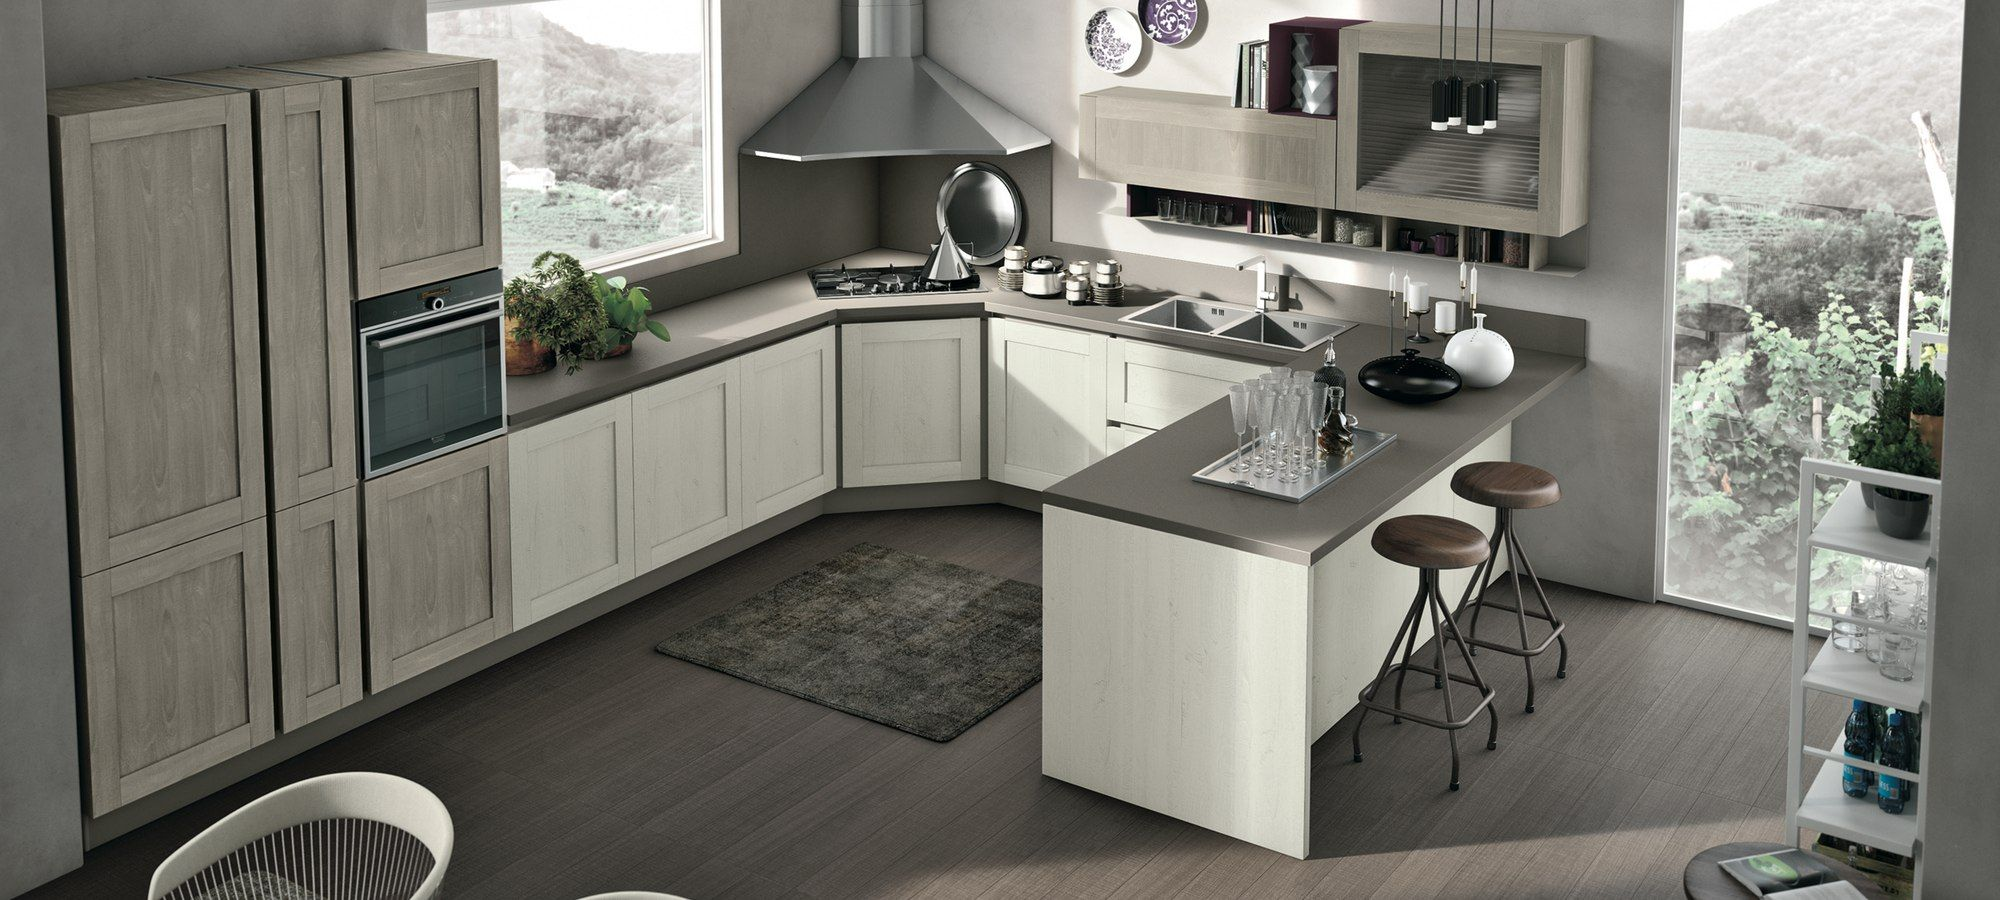 Cucine moderne stosa modello cucina city 06 housing for Cucine pinterest